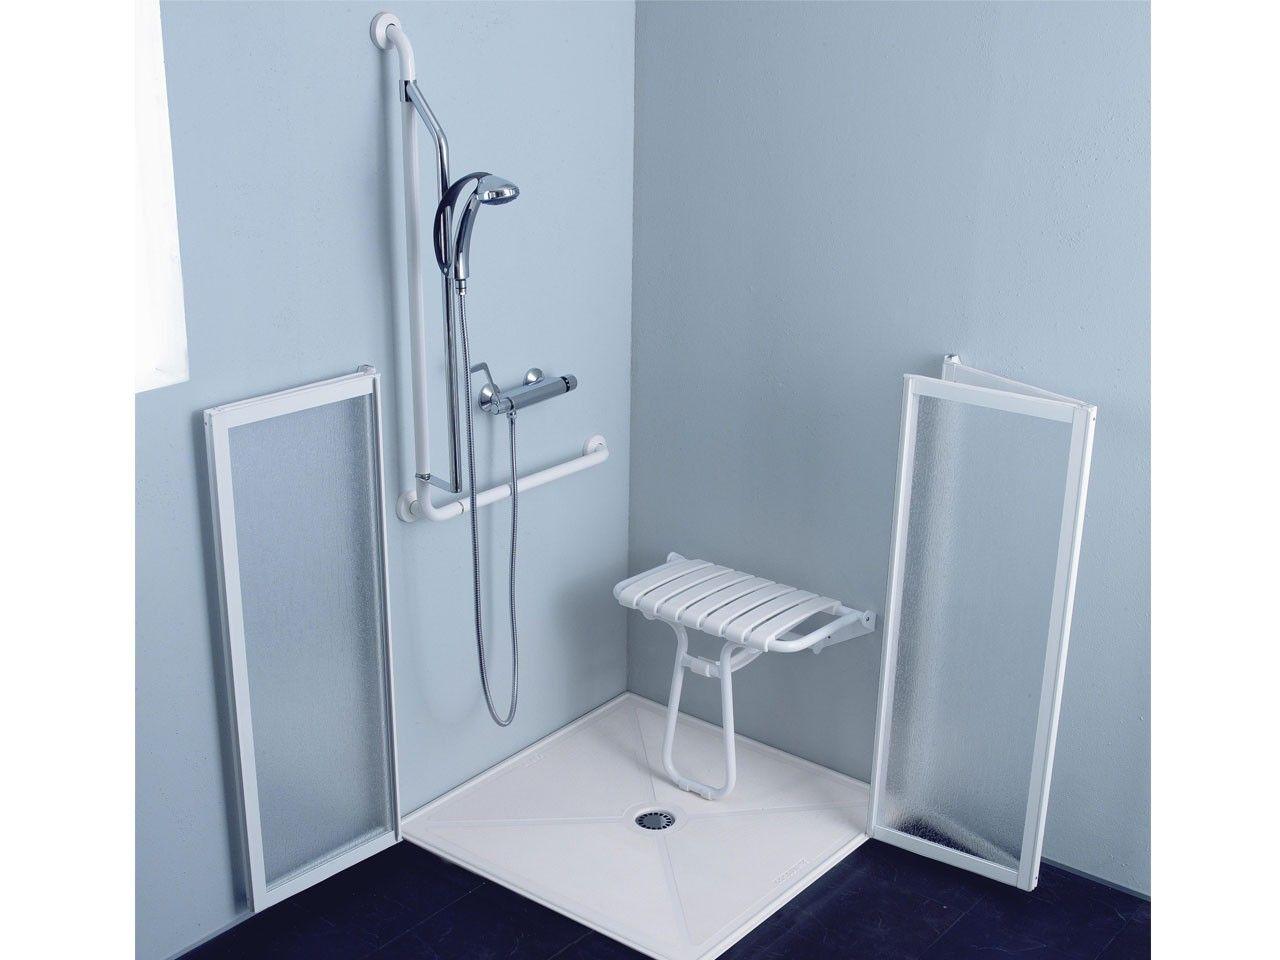 Sedile Doccia Disabili : Box doccia disabili cm bianco venduto da iperceramica